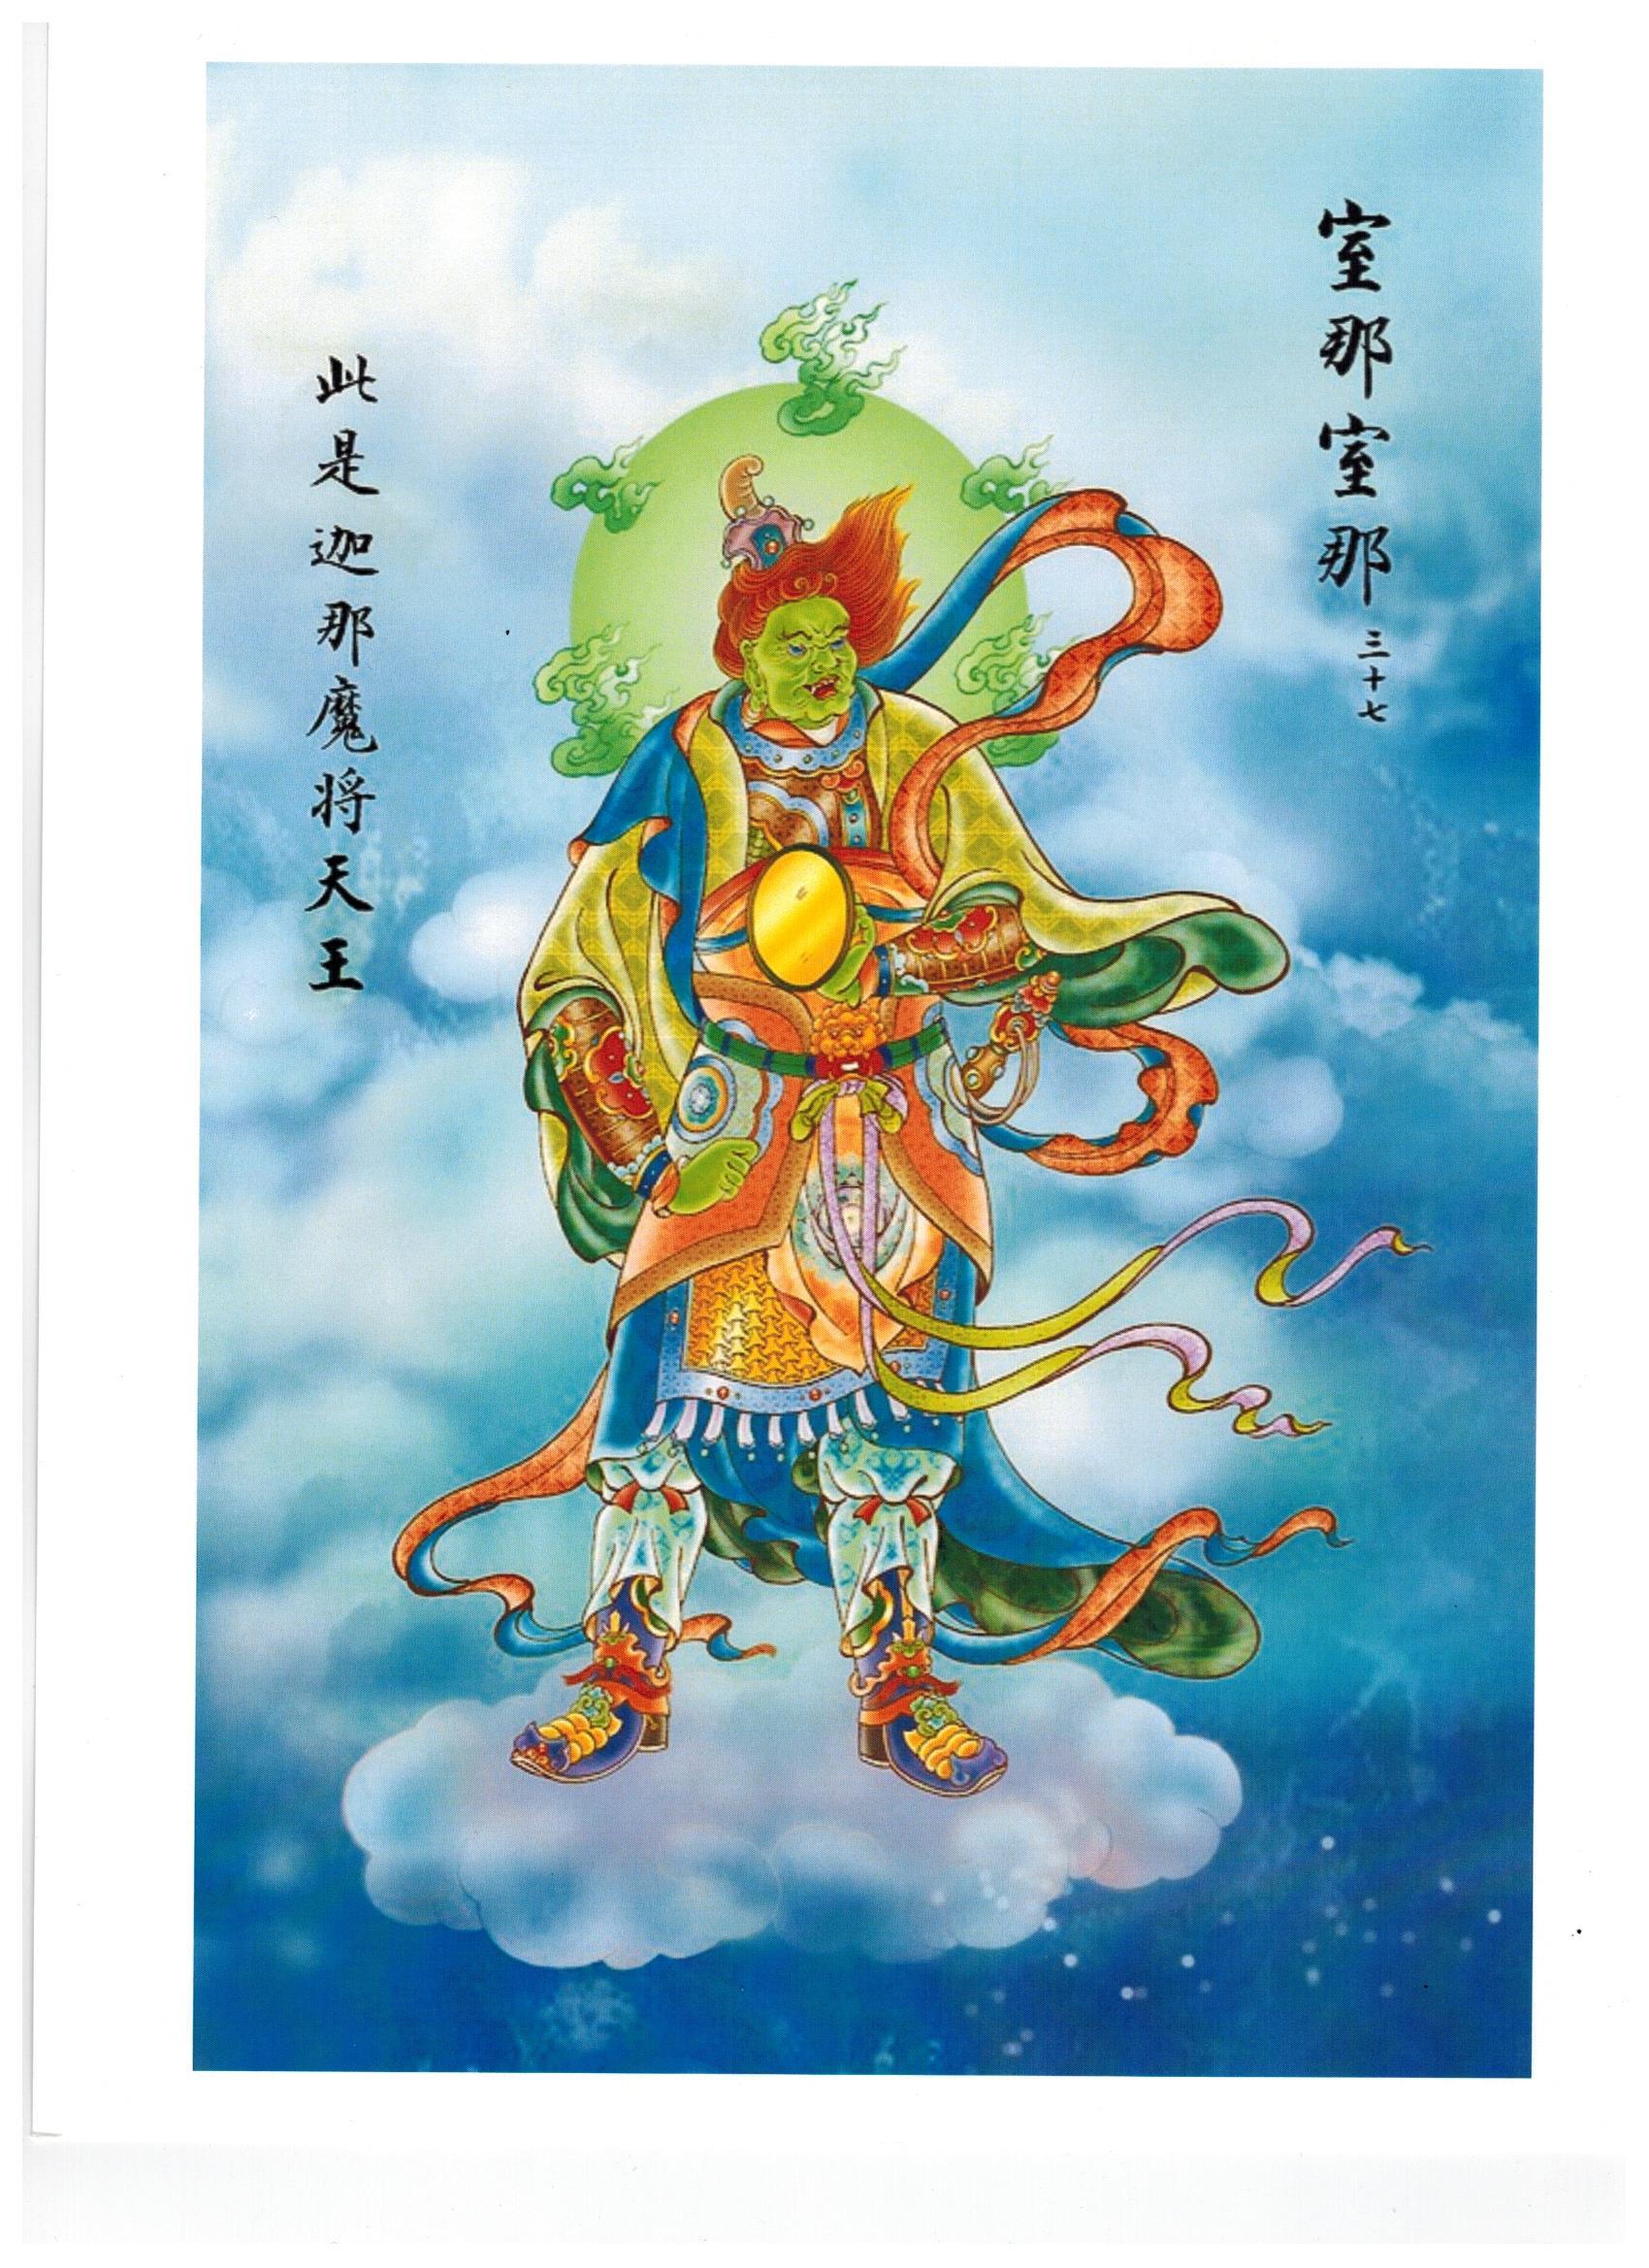 37 – Shi Nu Shi Nu